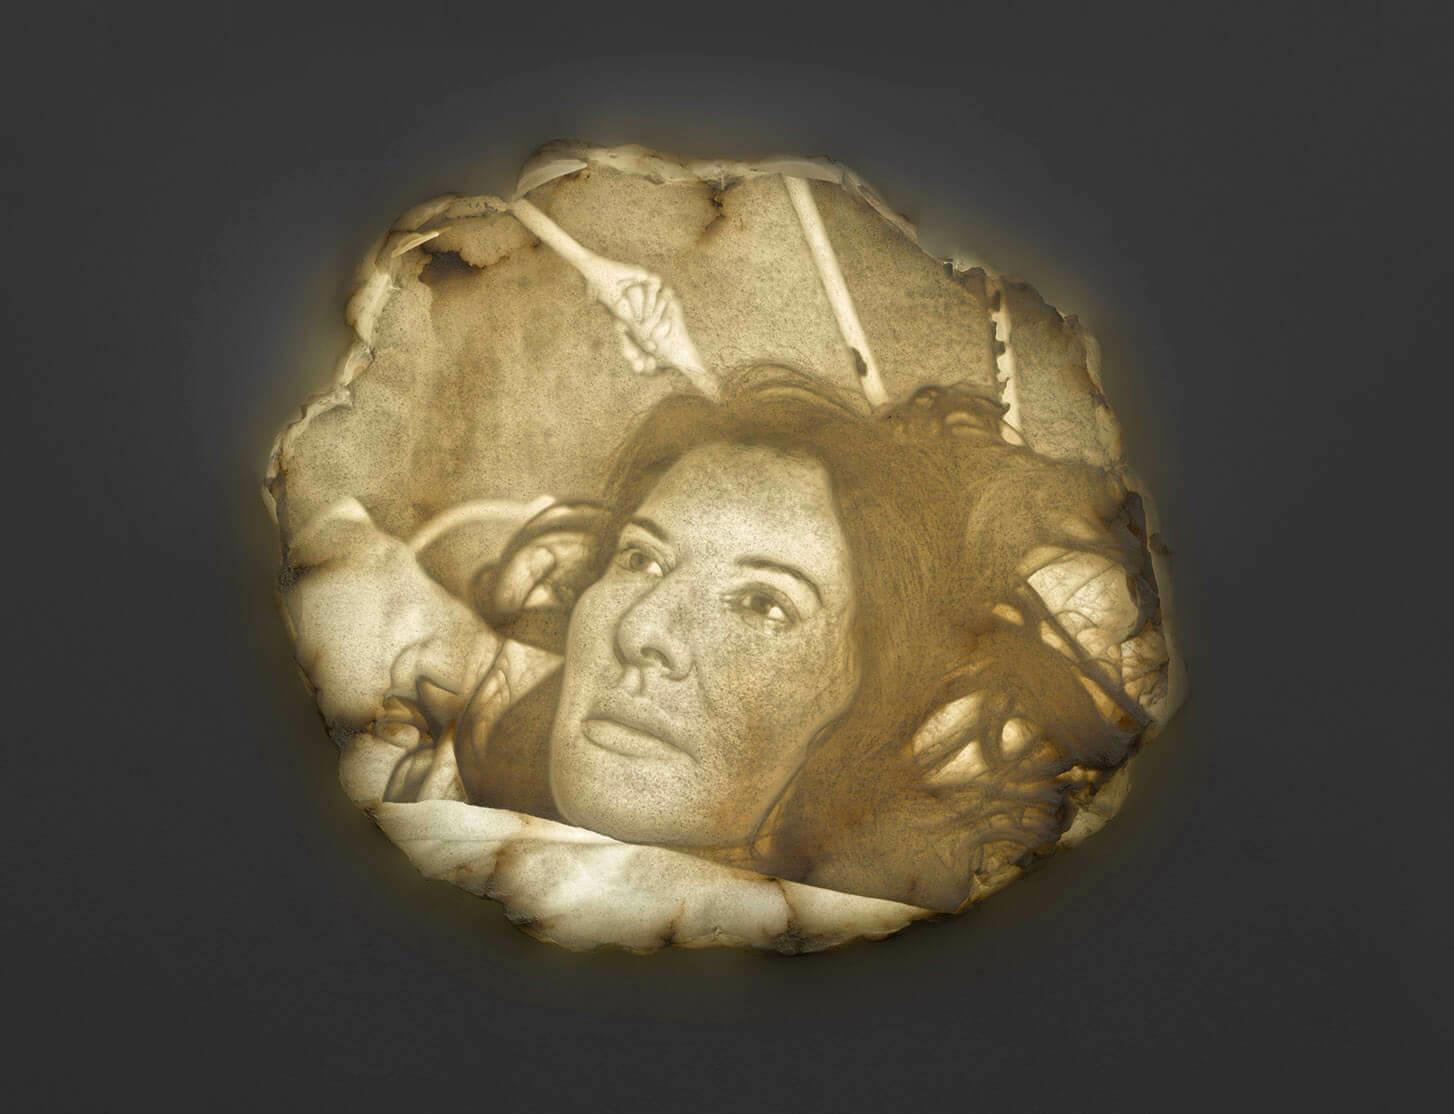 Lisson Gallery presents Marina Abramović alabaster works for TEFAF Online